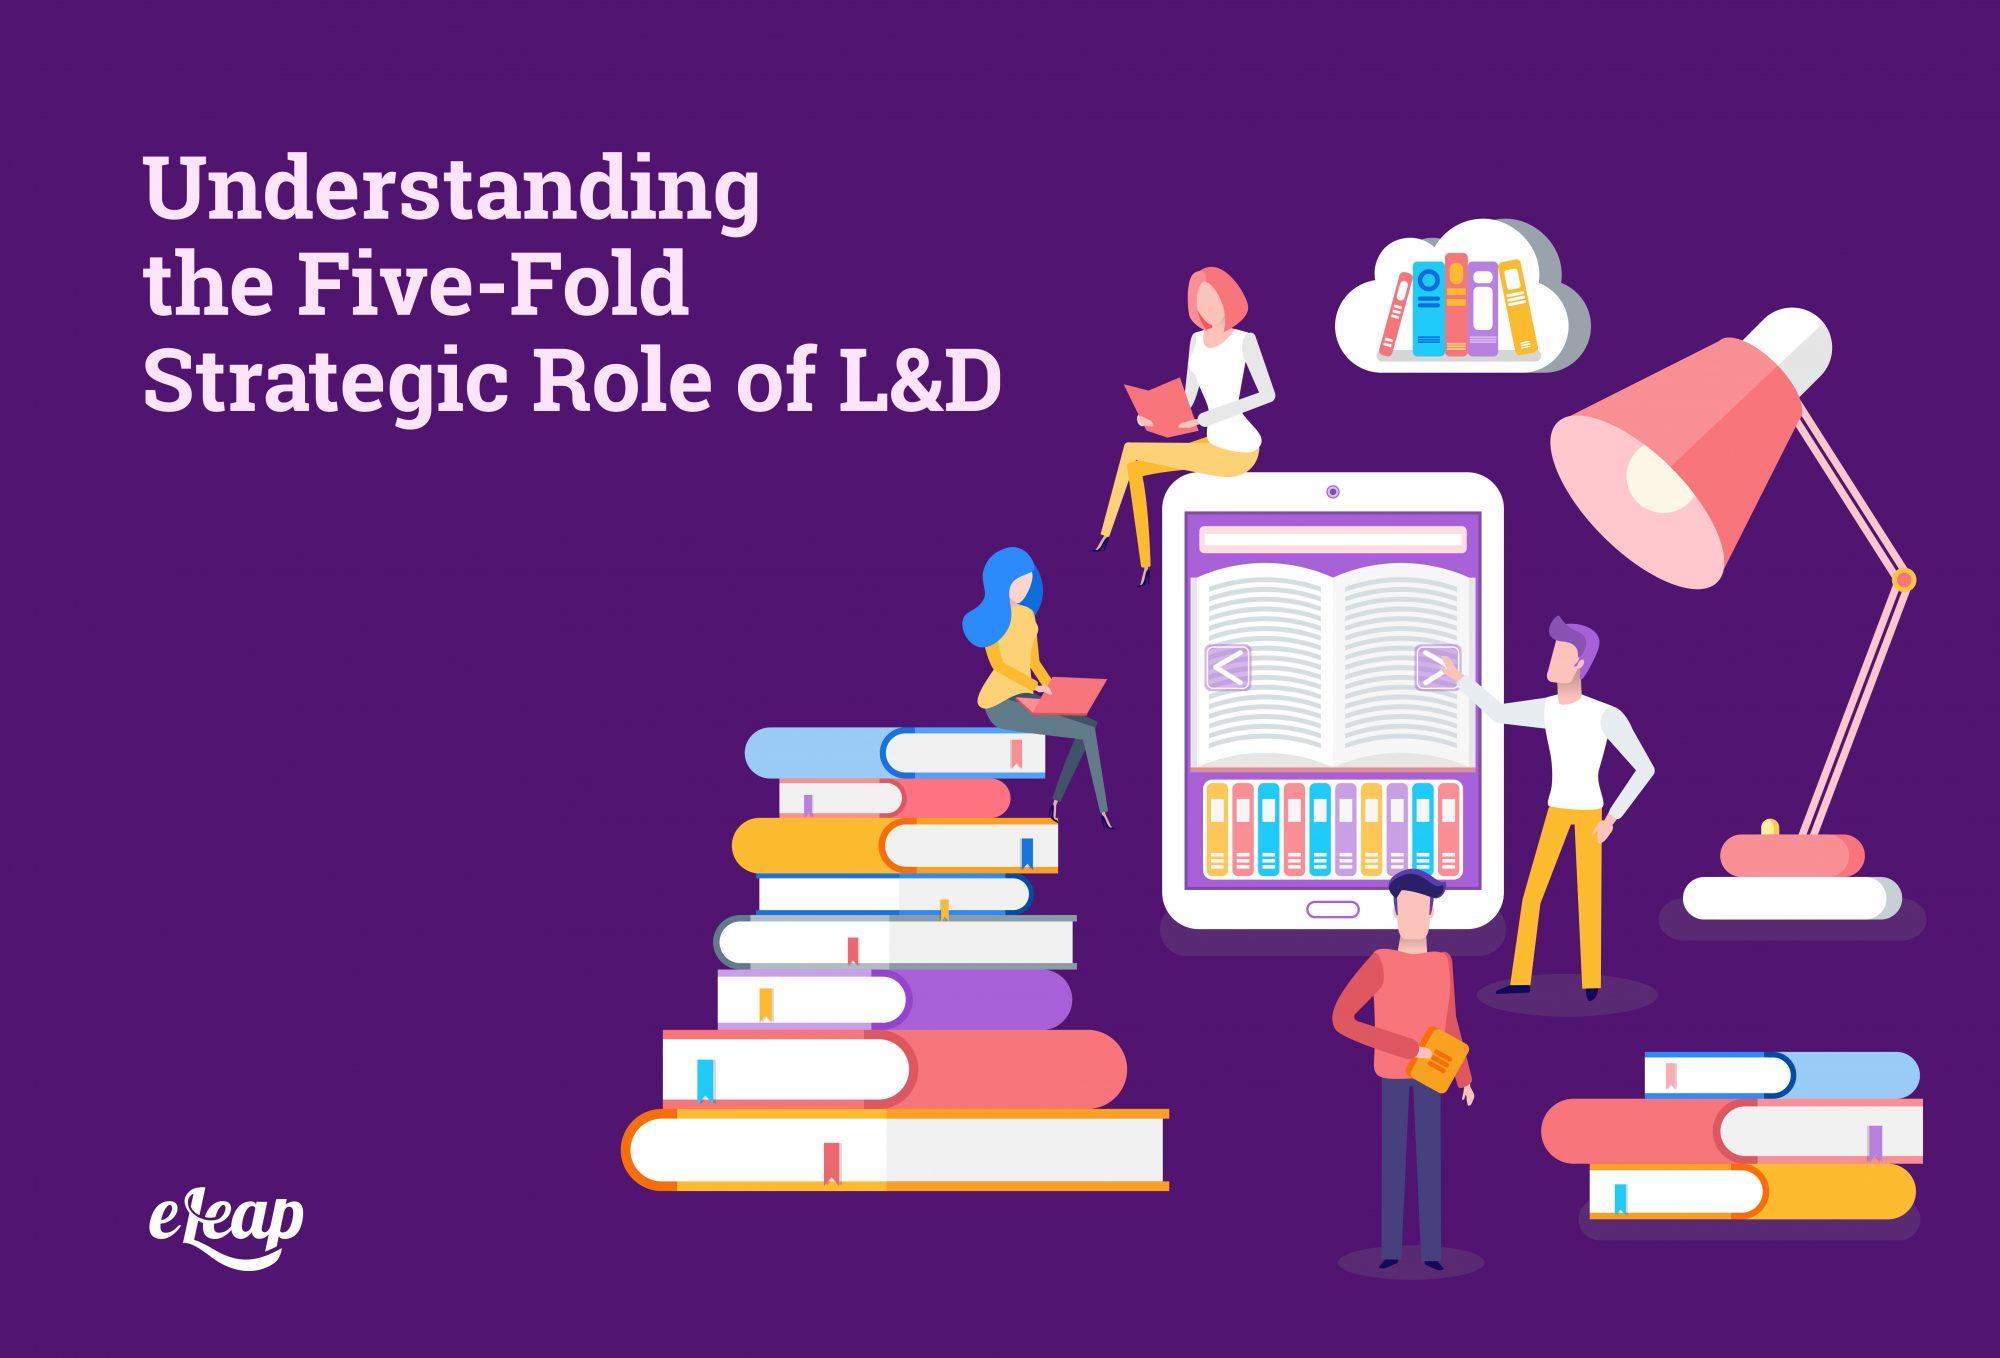 Understanding the Five-Fold Strategic Role of L&D